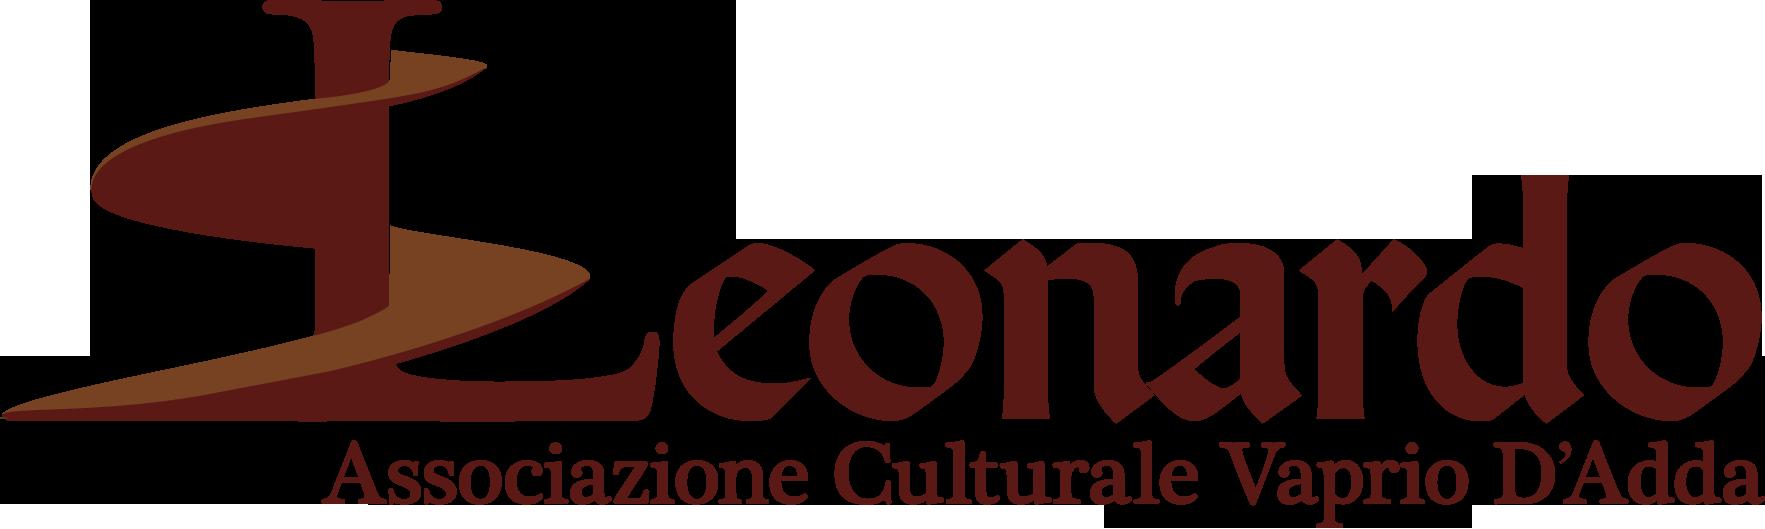 Associazione Culturale Leonardo, Vaprio d'Adda